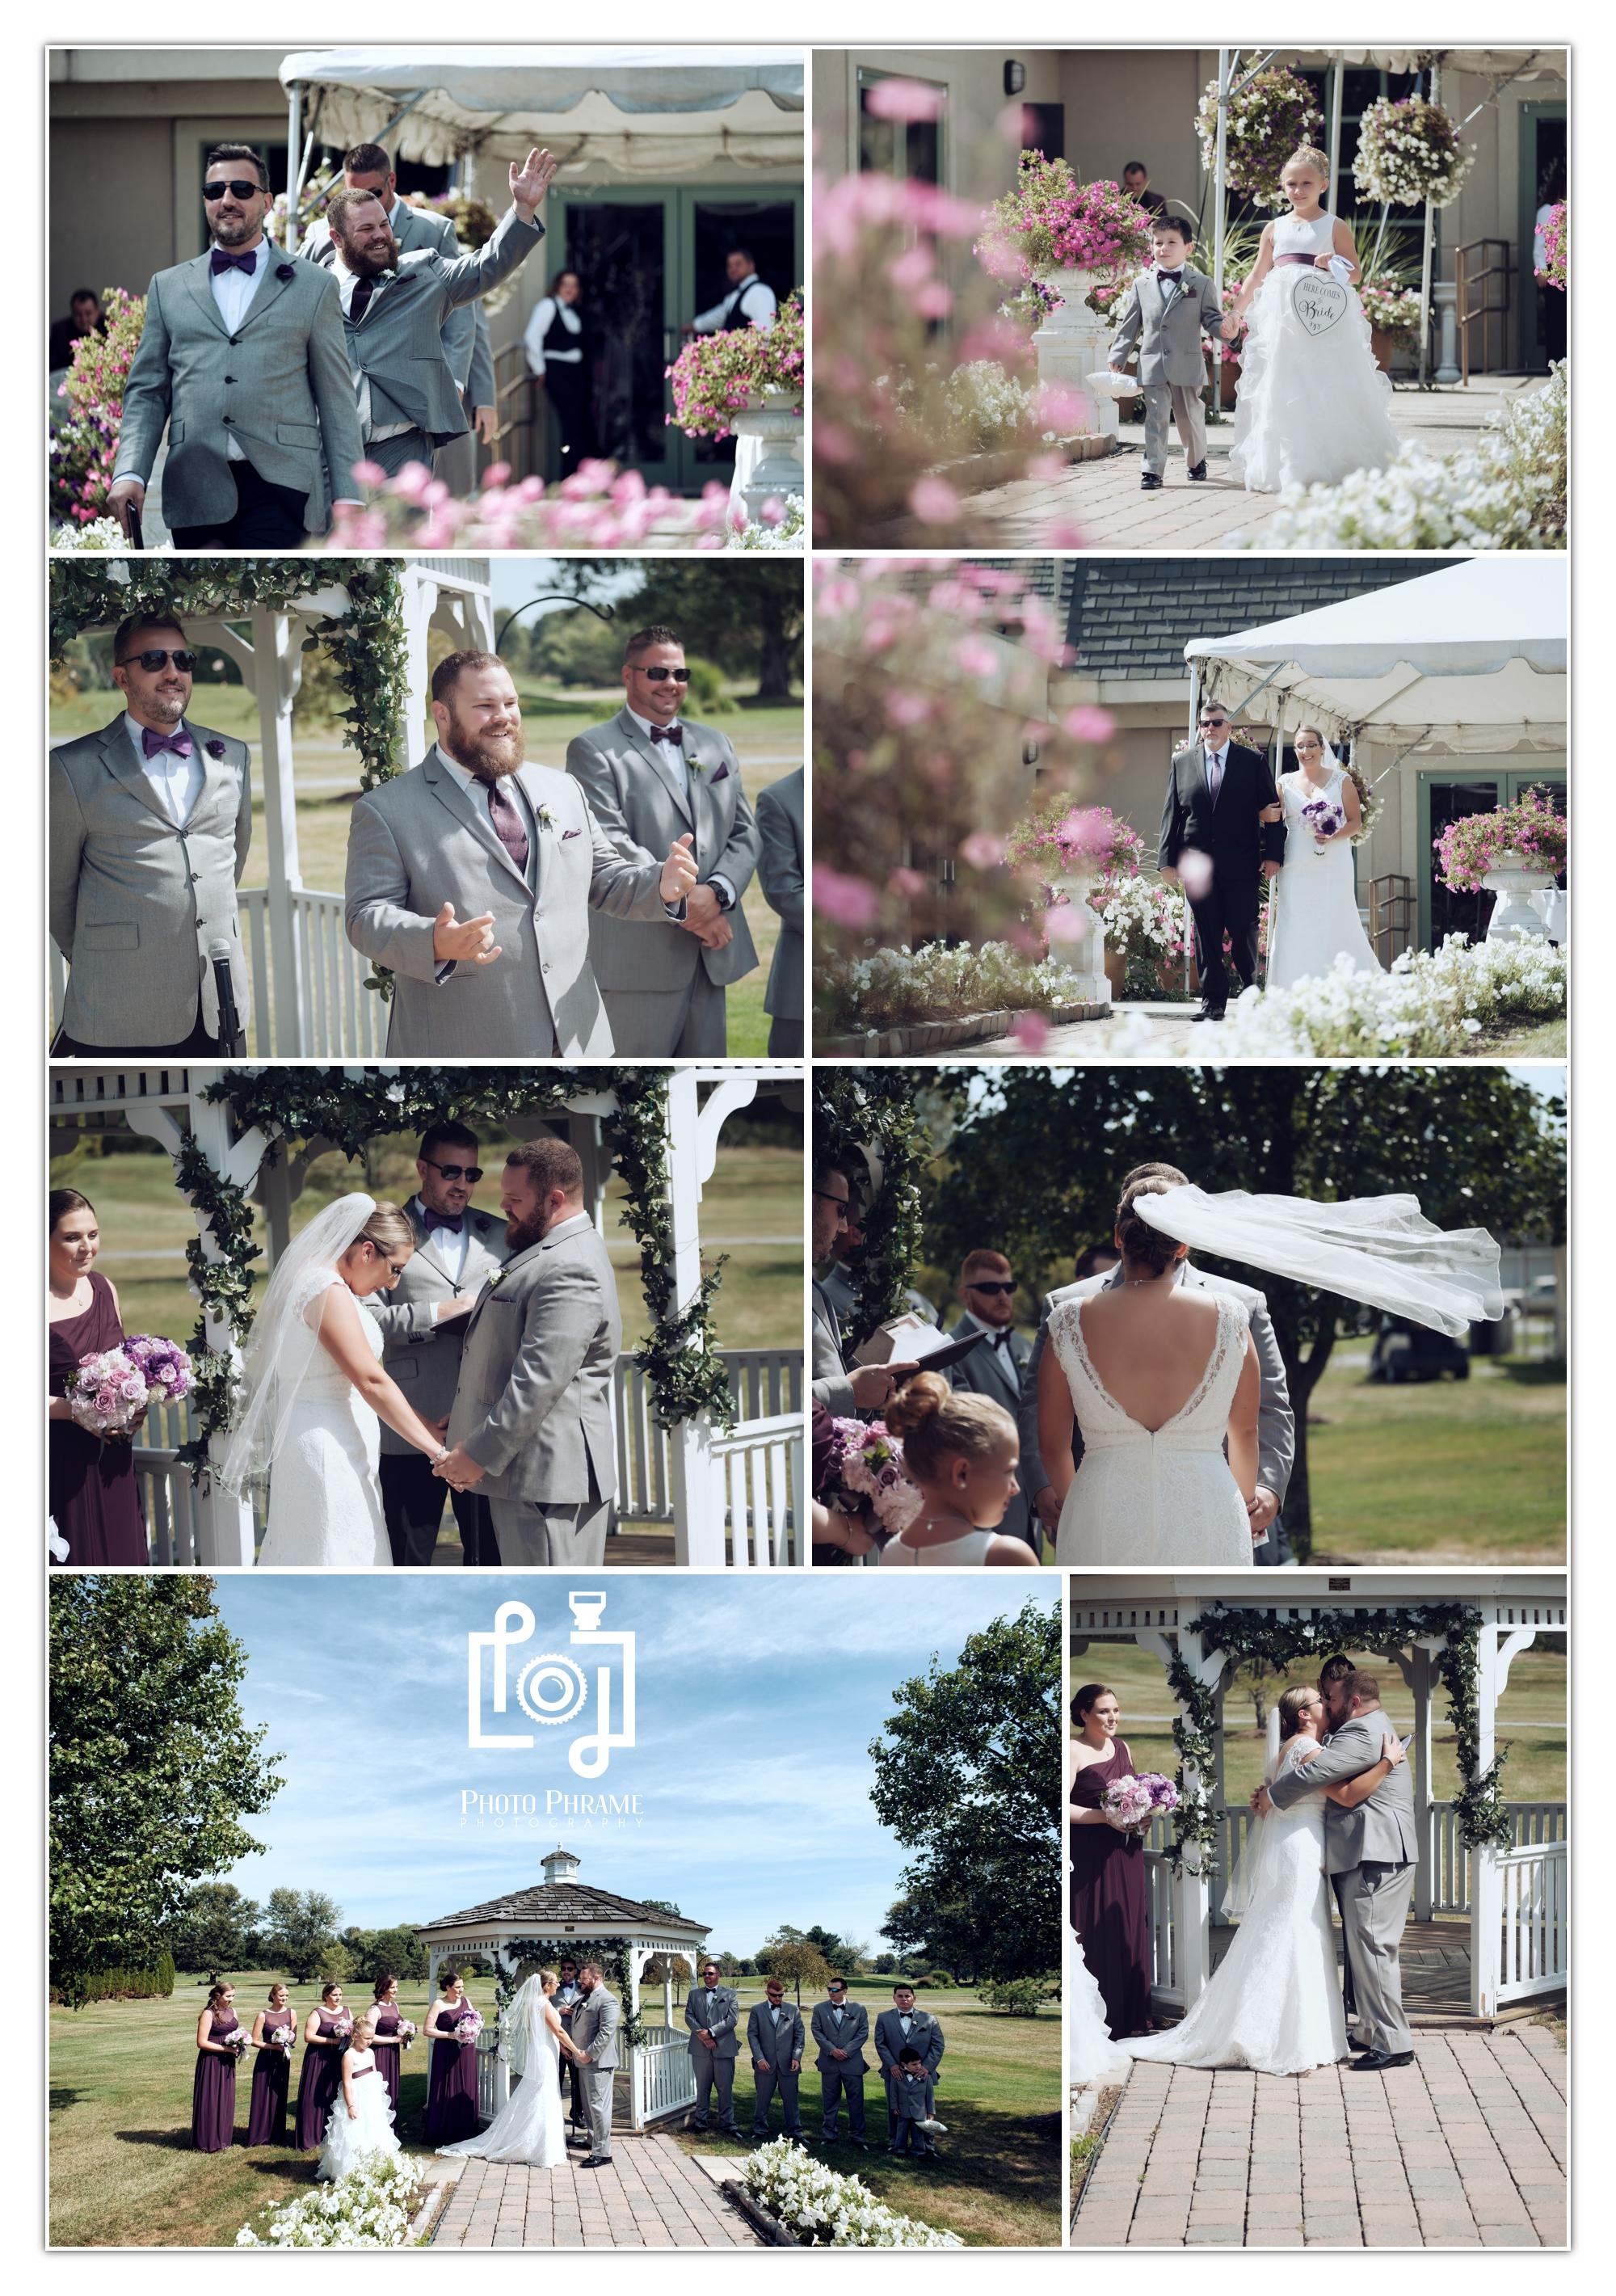 Photo Phrame Wedding Photography